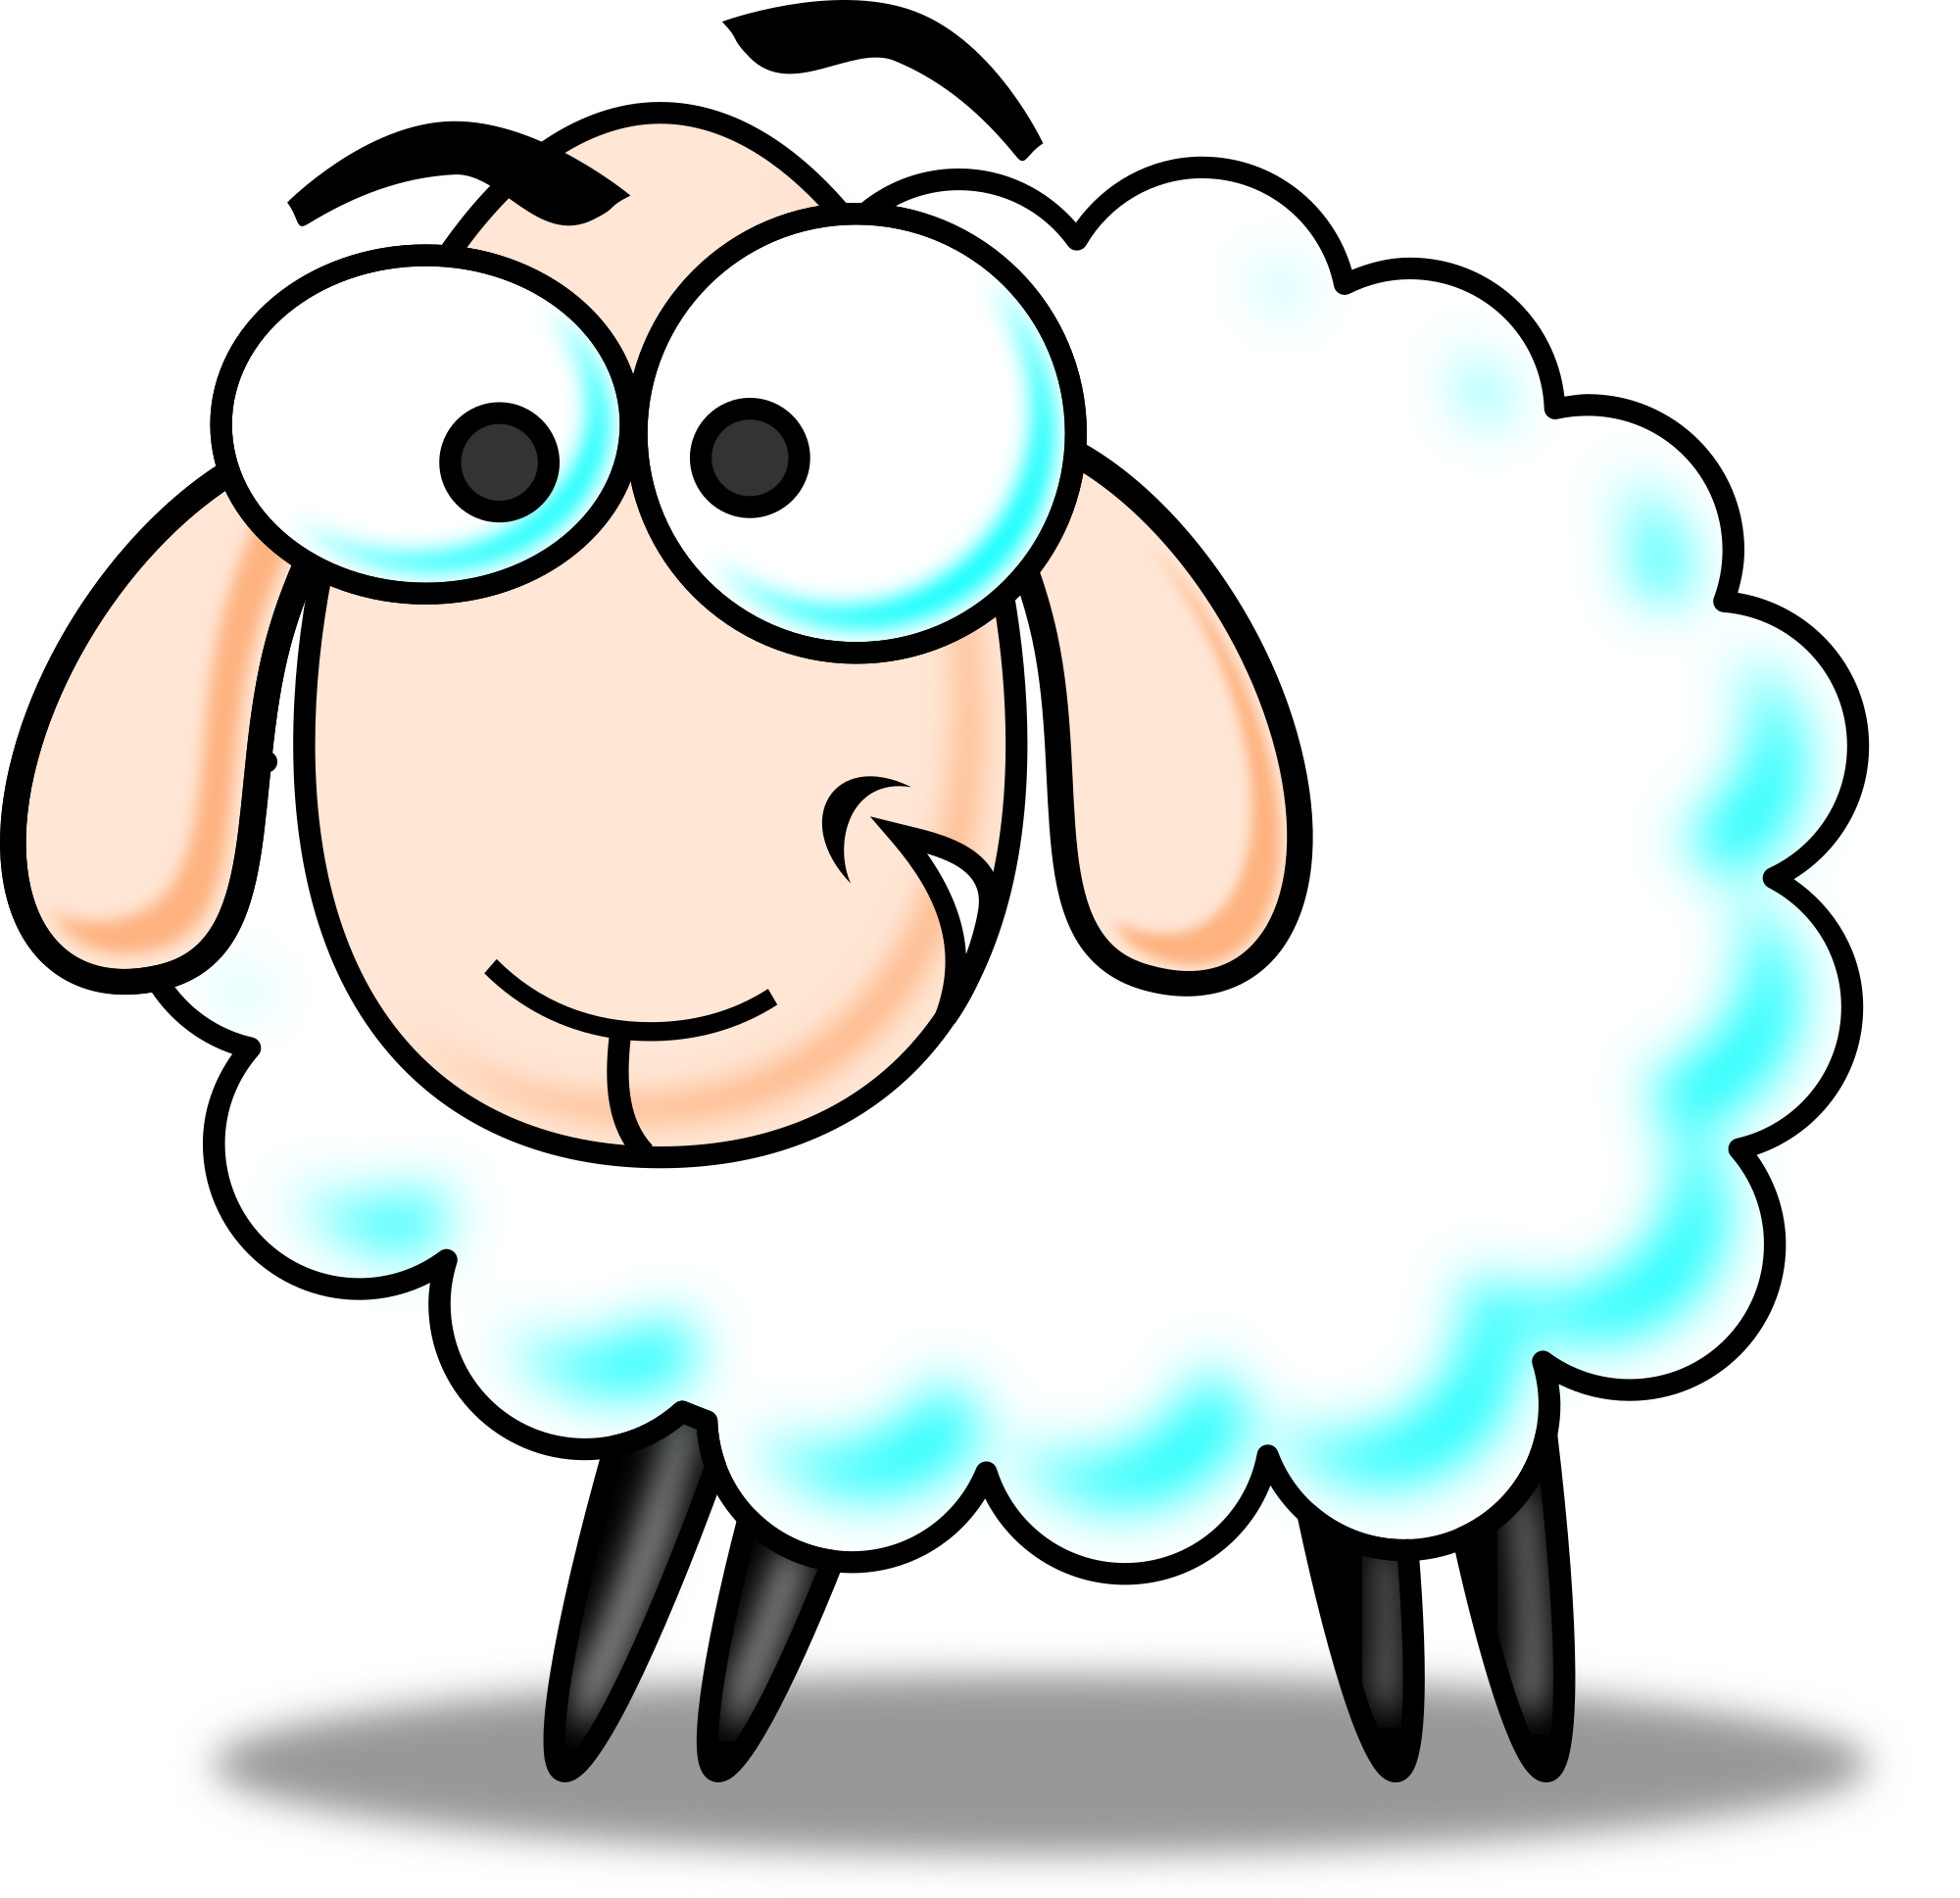 Free cartoon sheep clip art .-Free cartoon sheep clip art .-5